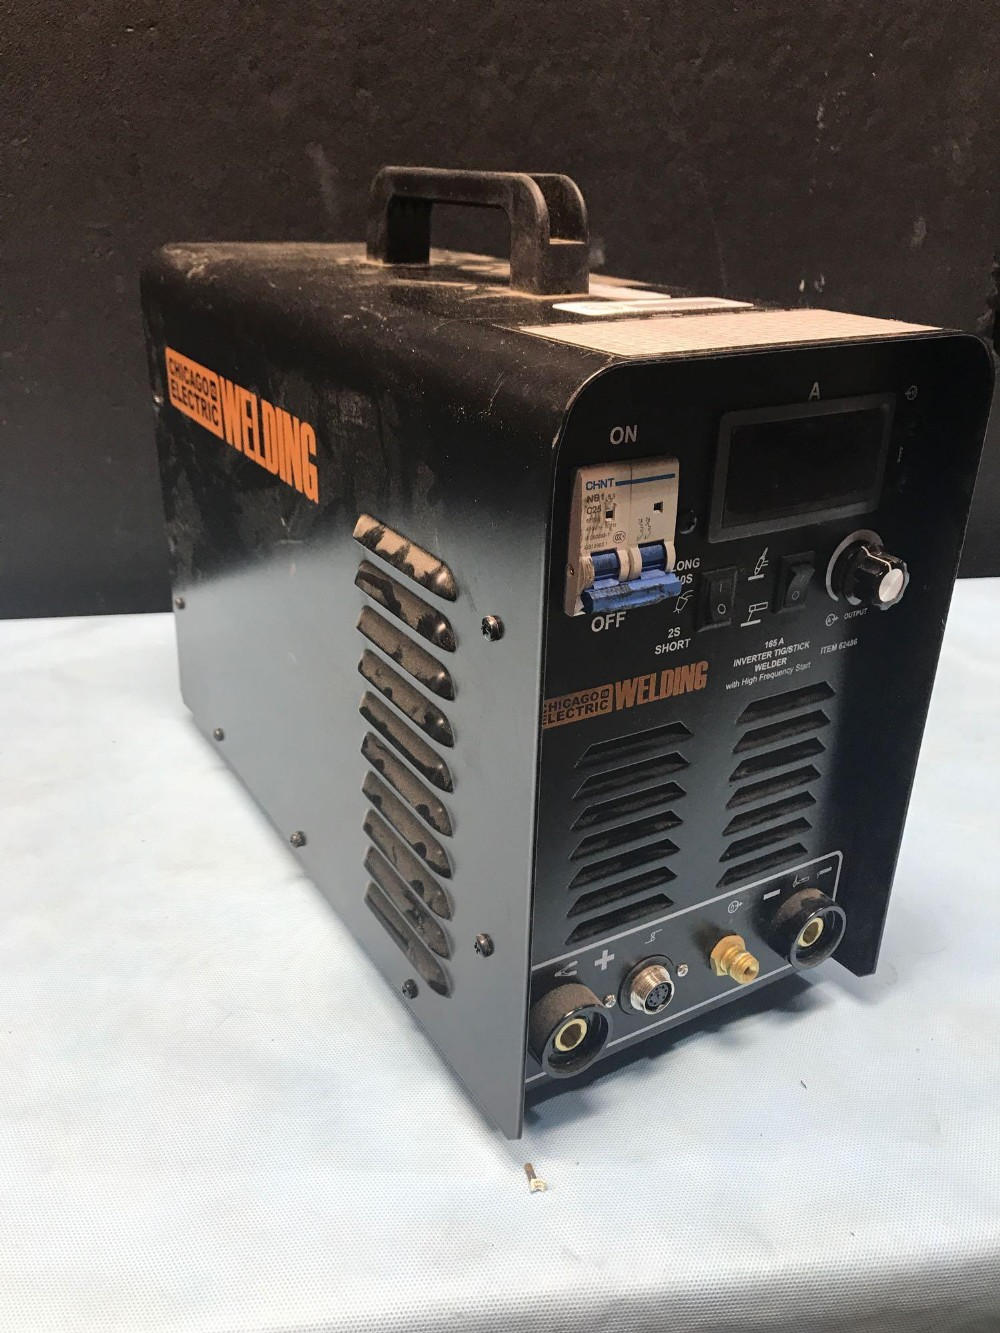 CHICAGO ELECTRIC WELDING 165A INVERTER TIG / STICK WELDER